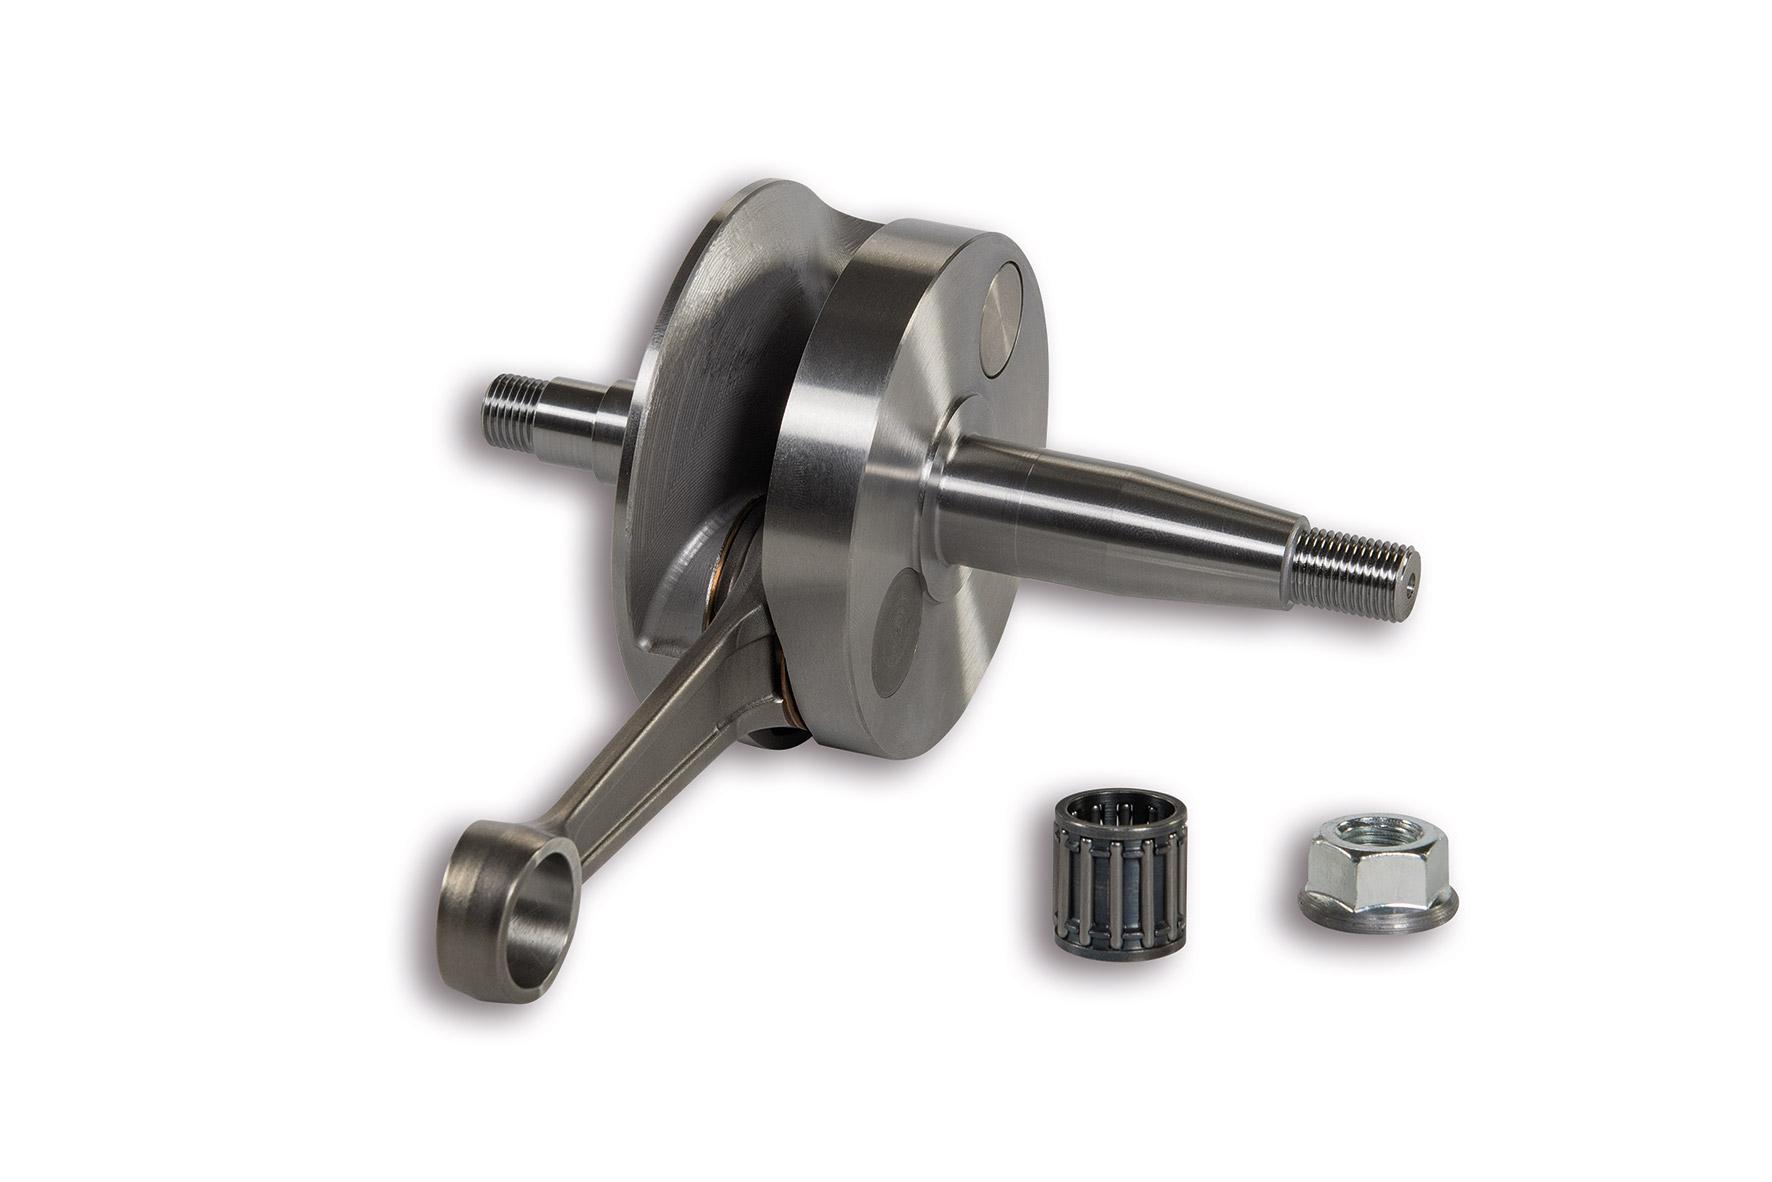 CRANKSHAFT pin Ø 15 rod 97 (stroke 51 mm) rotating valve - cone Ø 20